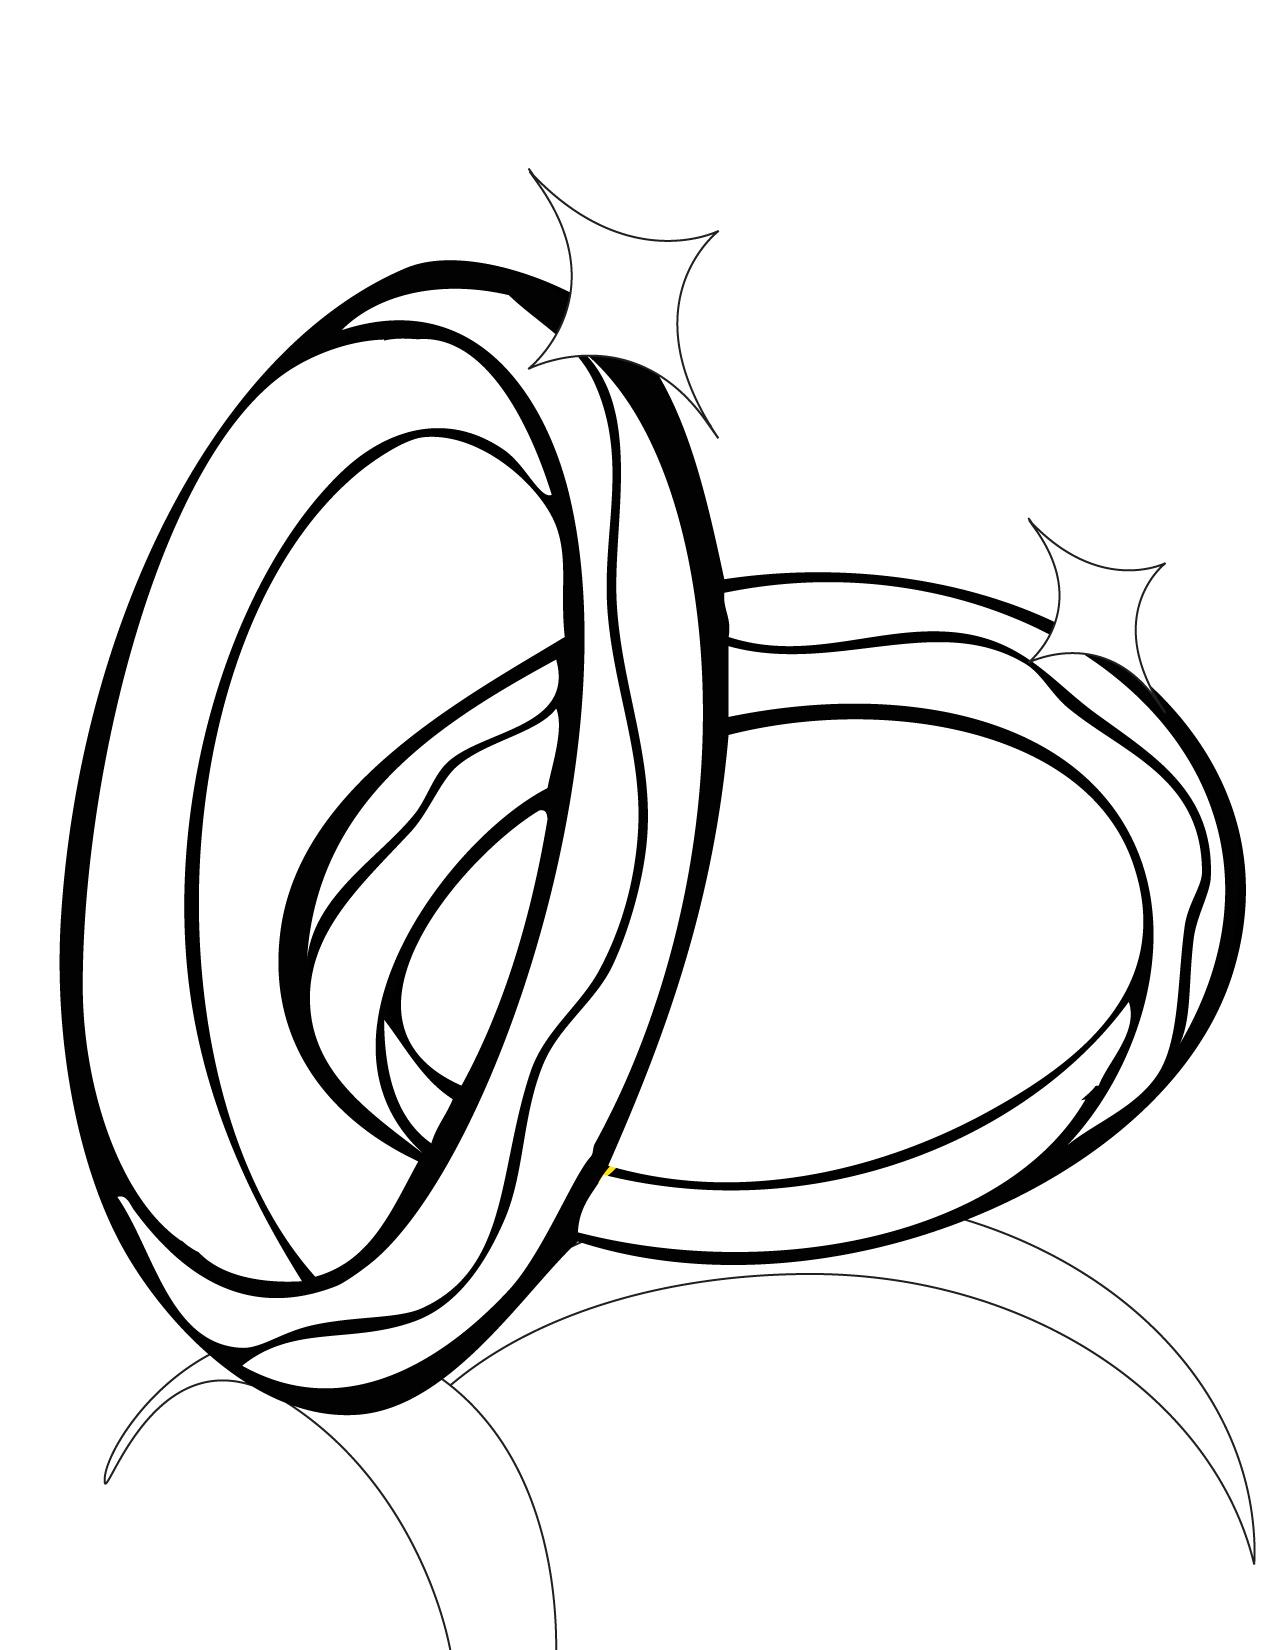 1275x1650 Wedding Ring Drawing Wedding Ring Drawings Free Download Clip